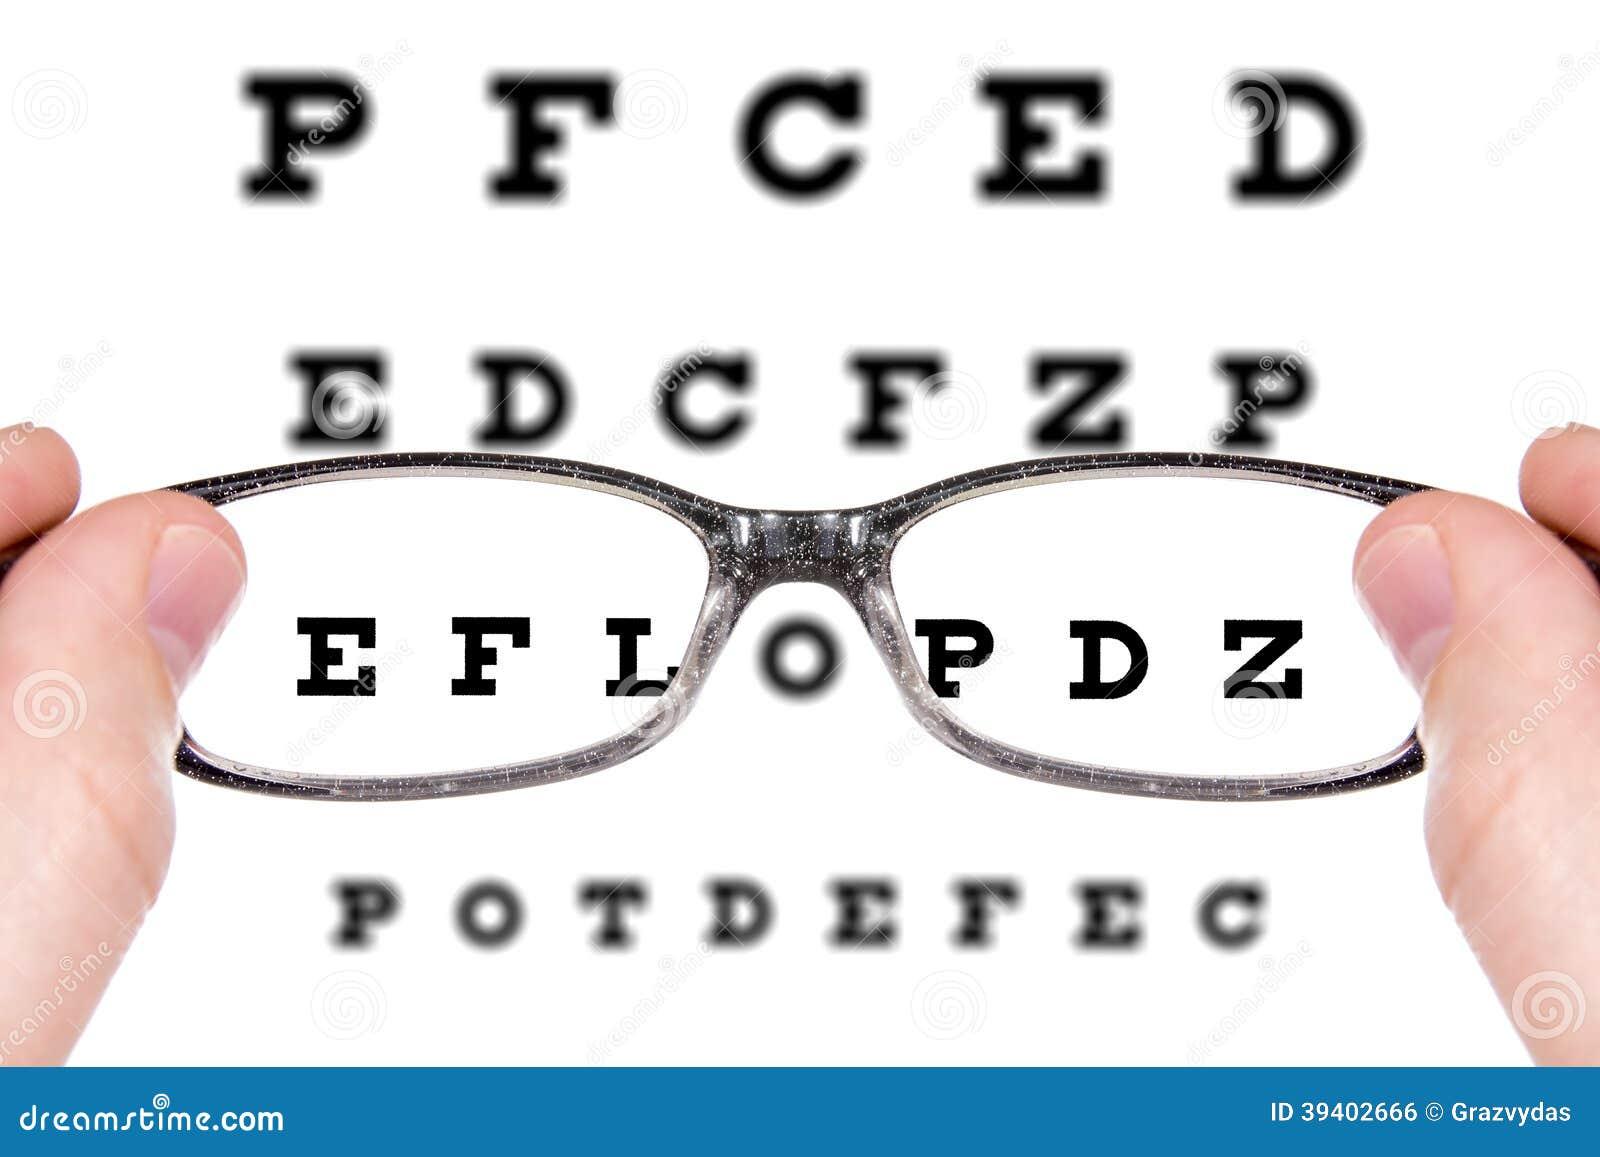 how to avoid eye sight